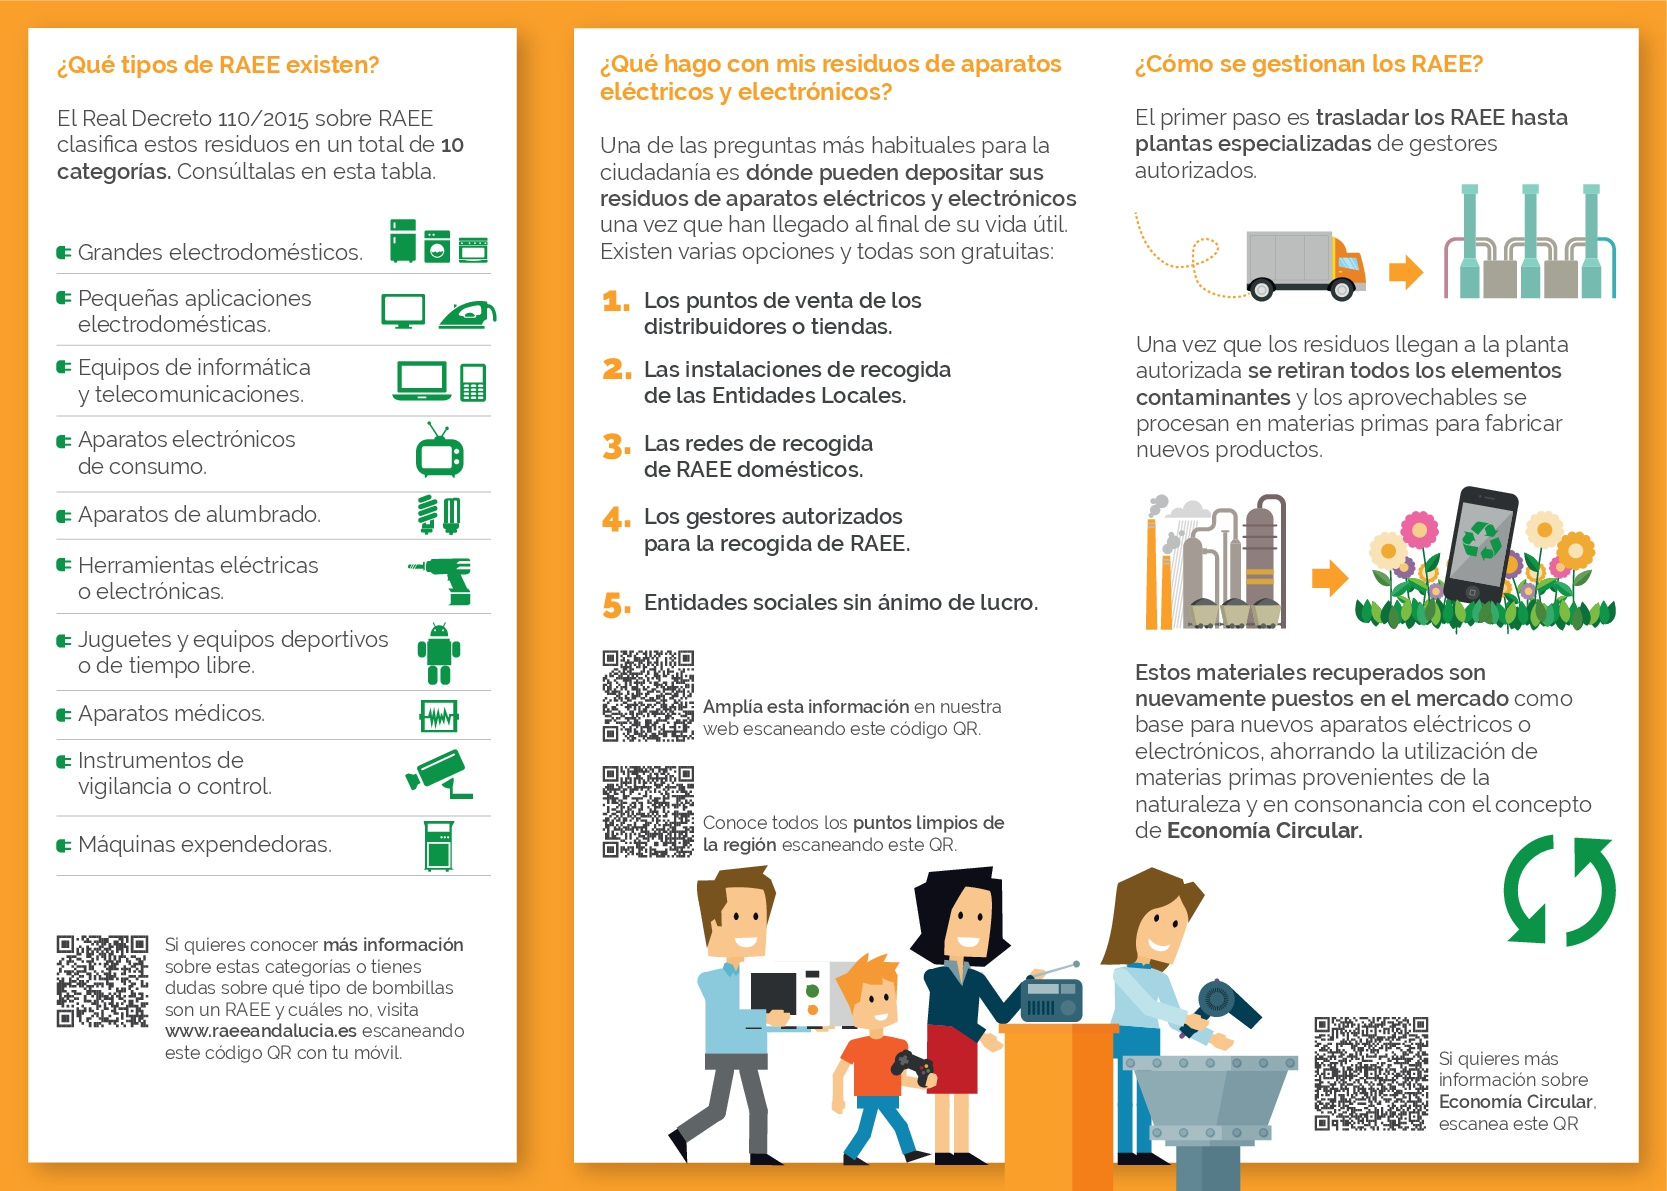 https://www.palmadelrio.es/sites/default/files/triptico-kit-raee_kit-bienvenida-002.jpg